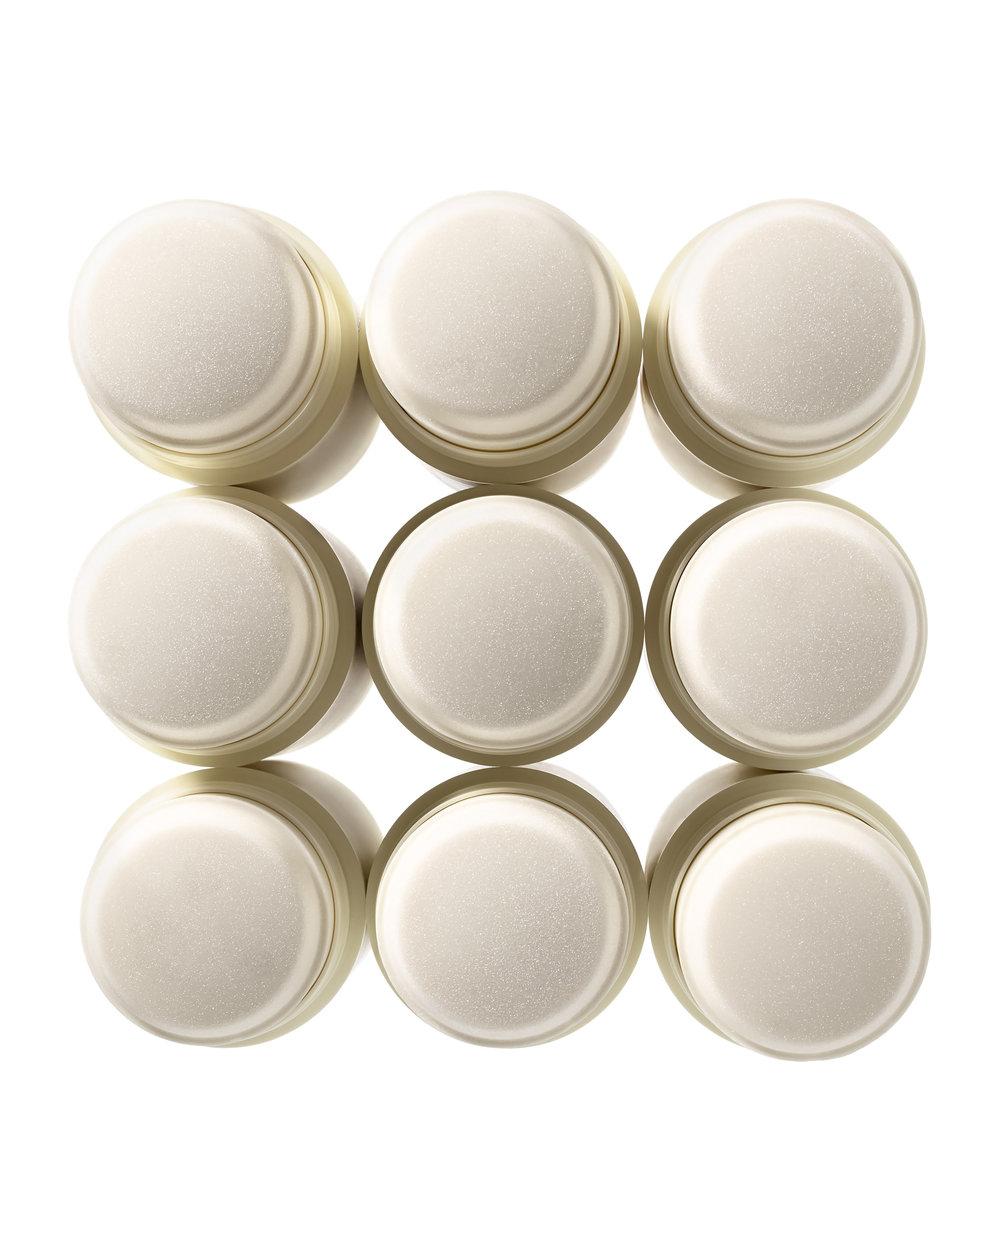 3087_23_MC_DKNY_+D1_Texture_Deodorant_13934_R1_2.jpg